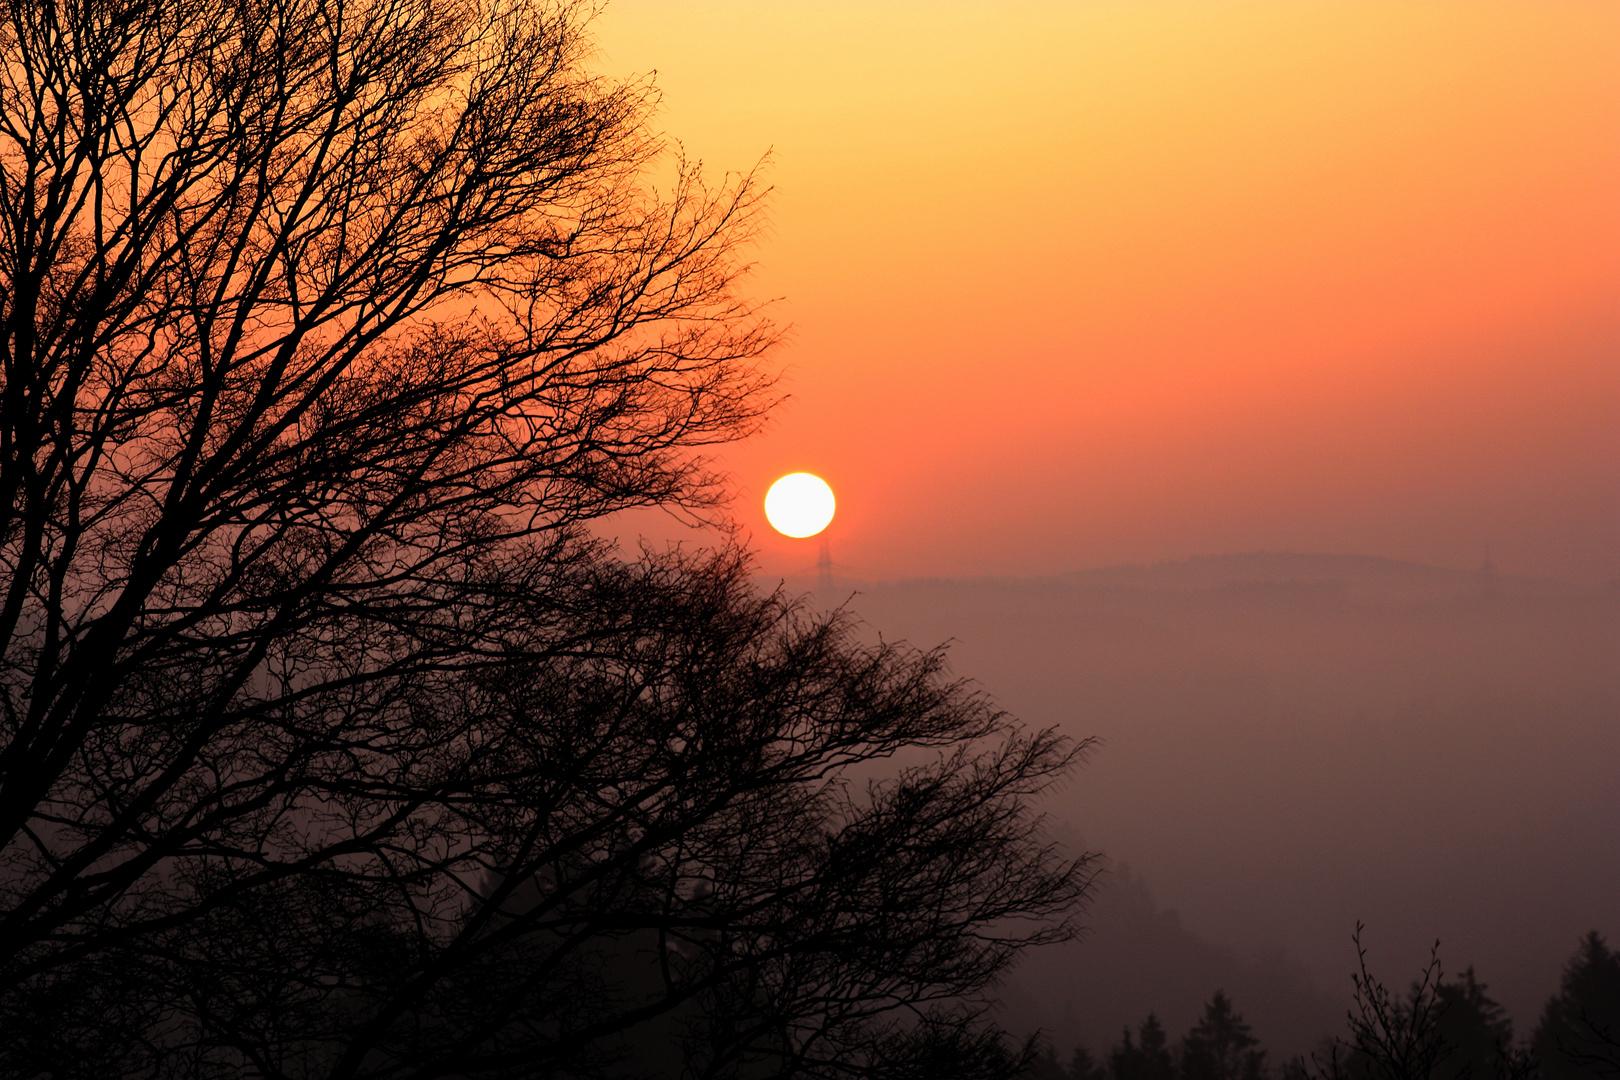 Feuerball am Morgen